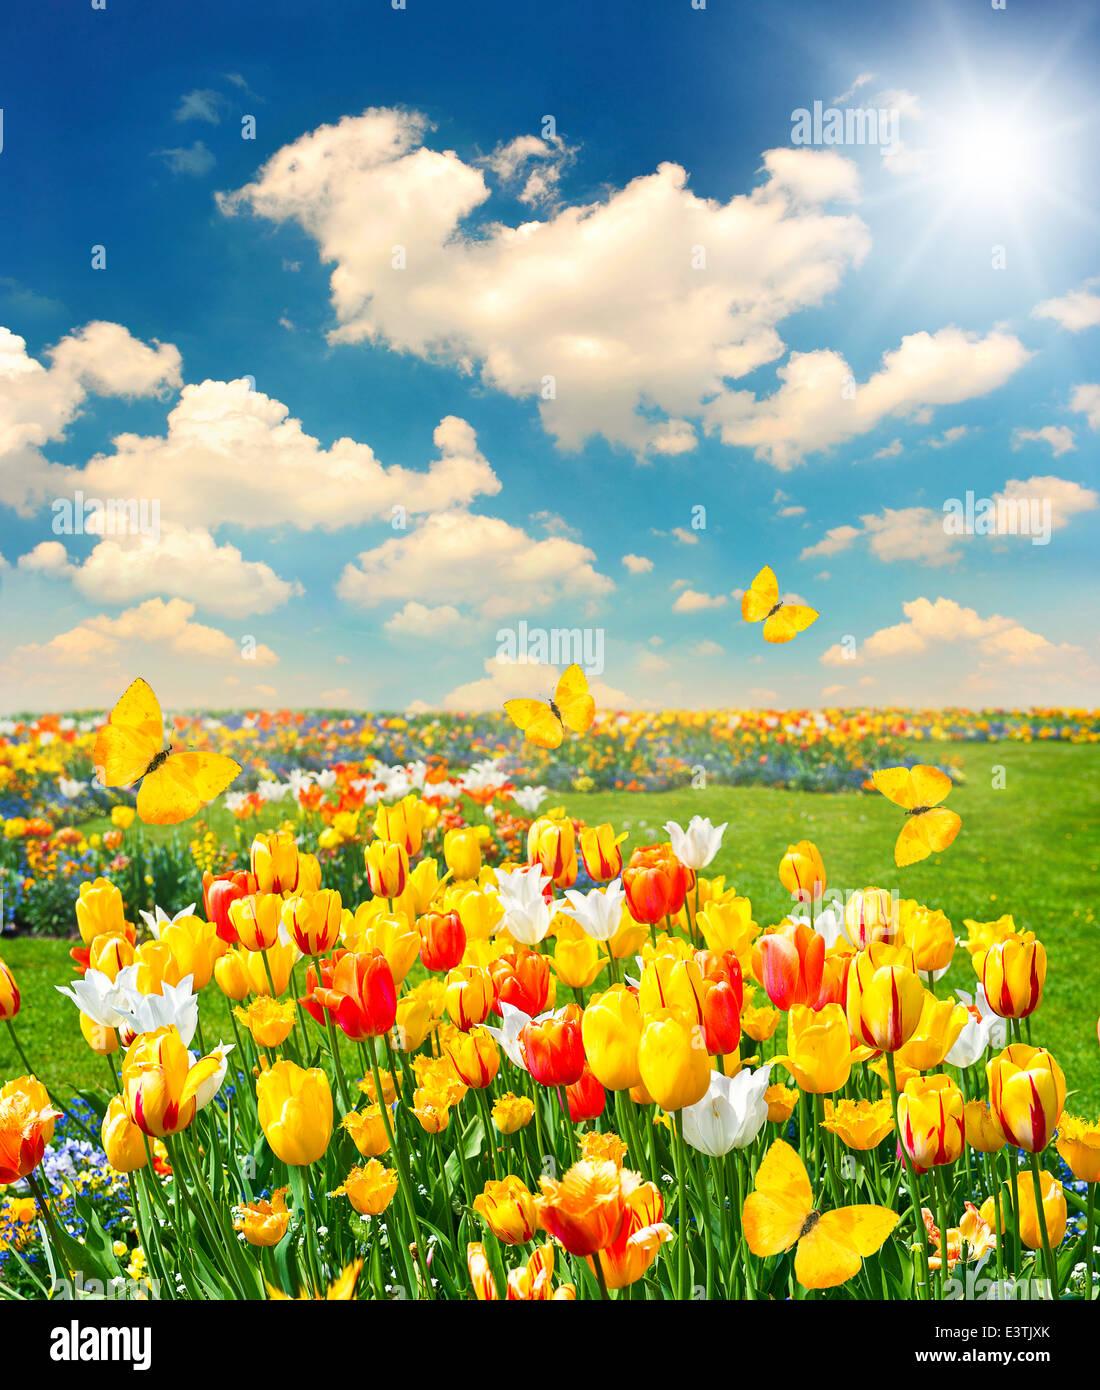 Summer Tulip Flowers Fields Sun Rays Morning Dawn 2560x1600 ...